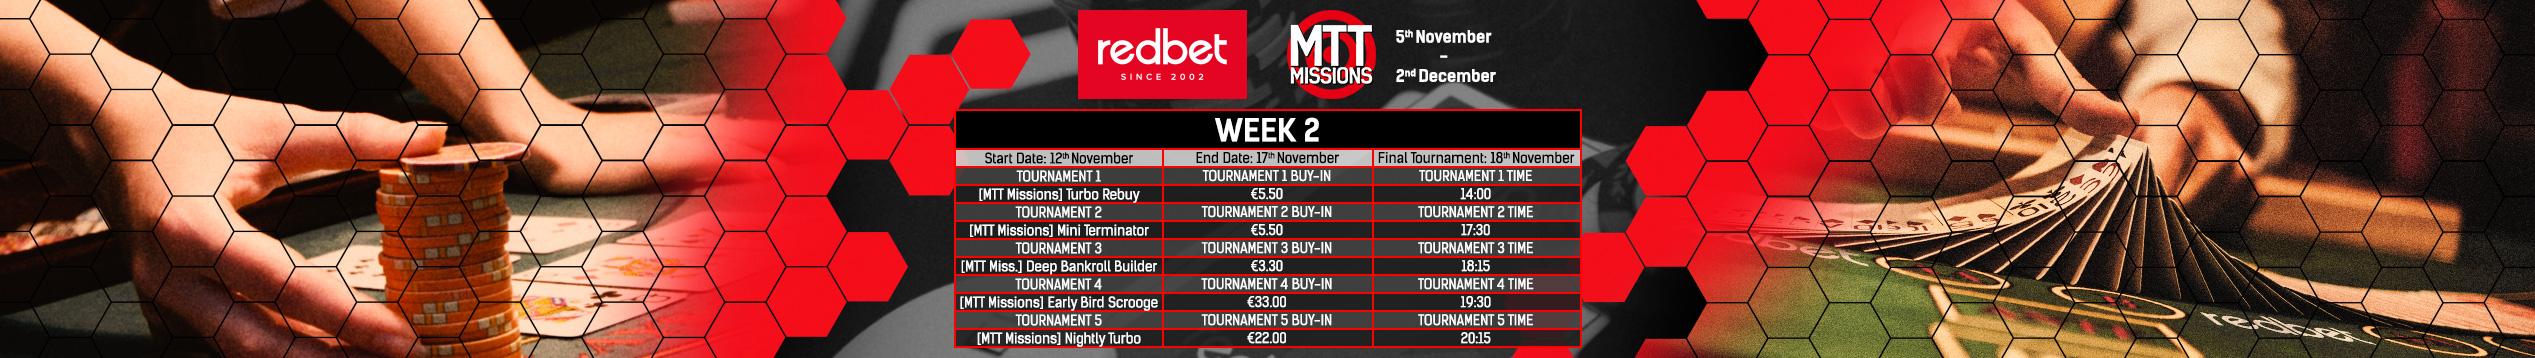 redbet MTT Missions